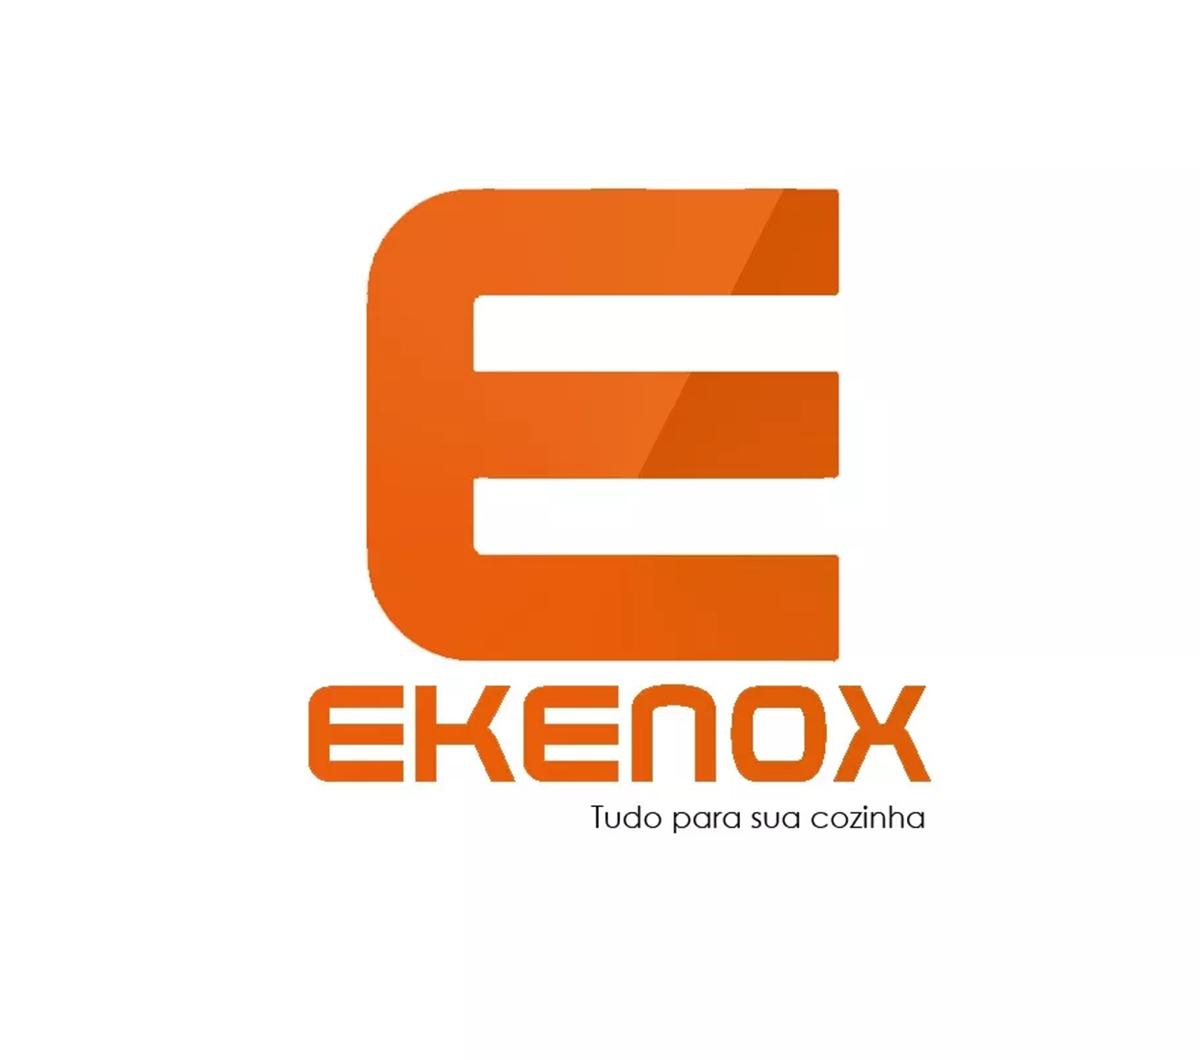 Kit 4 Unidades Gelo X Artificial Reutilizavel Gel 1000ml  - EKENOX- Equipamentos Industriais